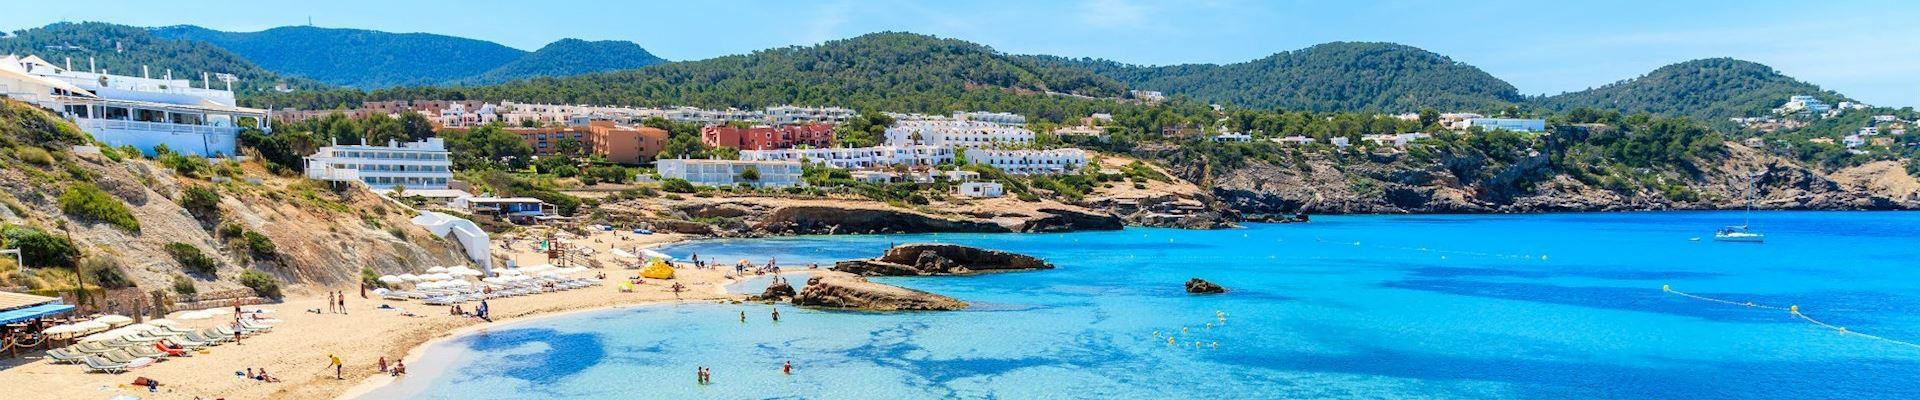 Ibiza Holidays 2019 2020 Balearic Islands All Inclusive